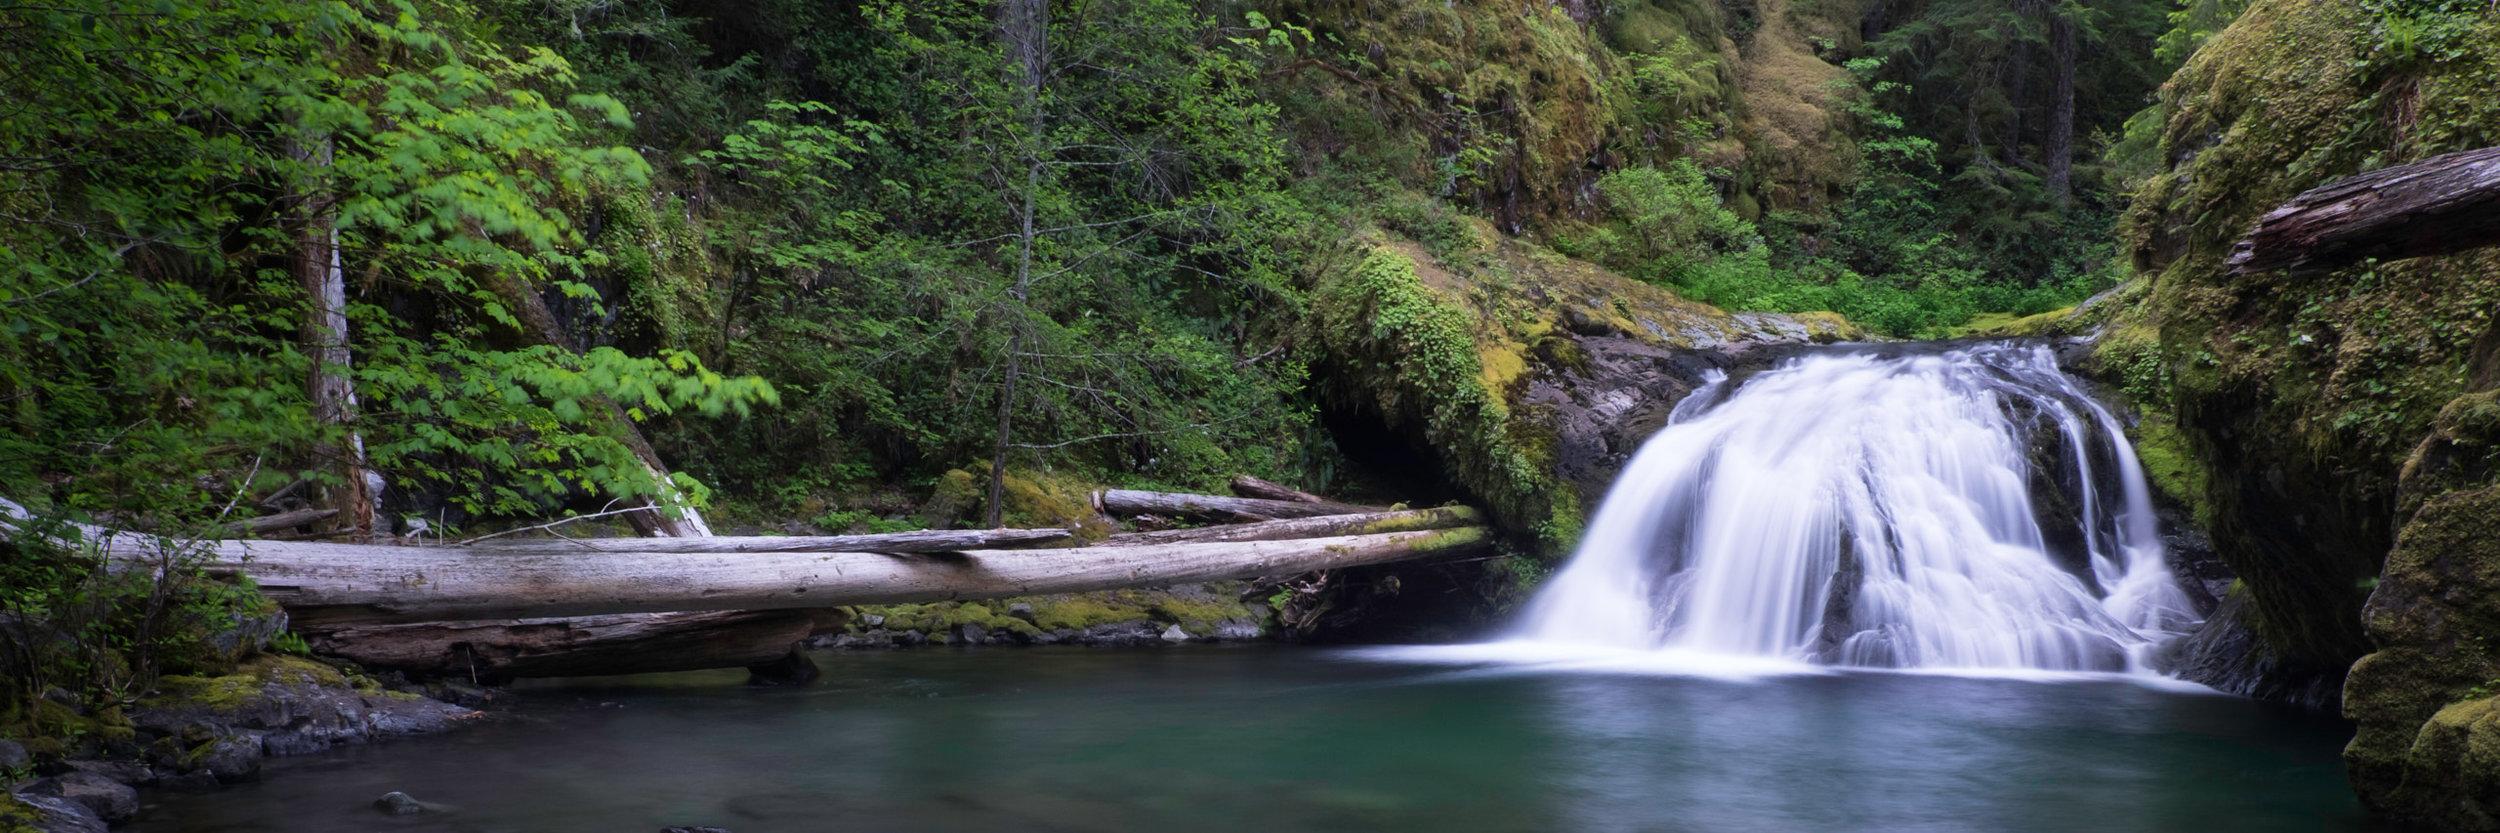 Brice Creek Pool Falls_2014 - -165-20140601_Brice_Creek_0166.jpg